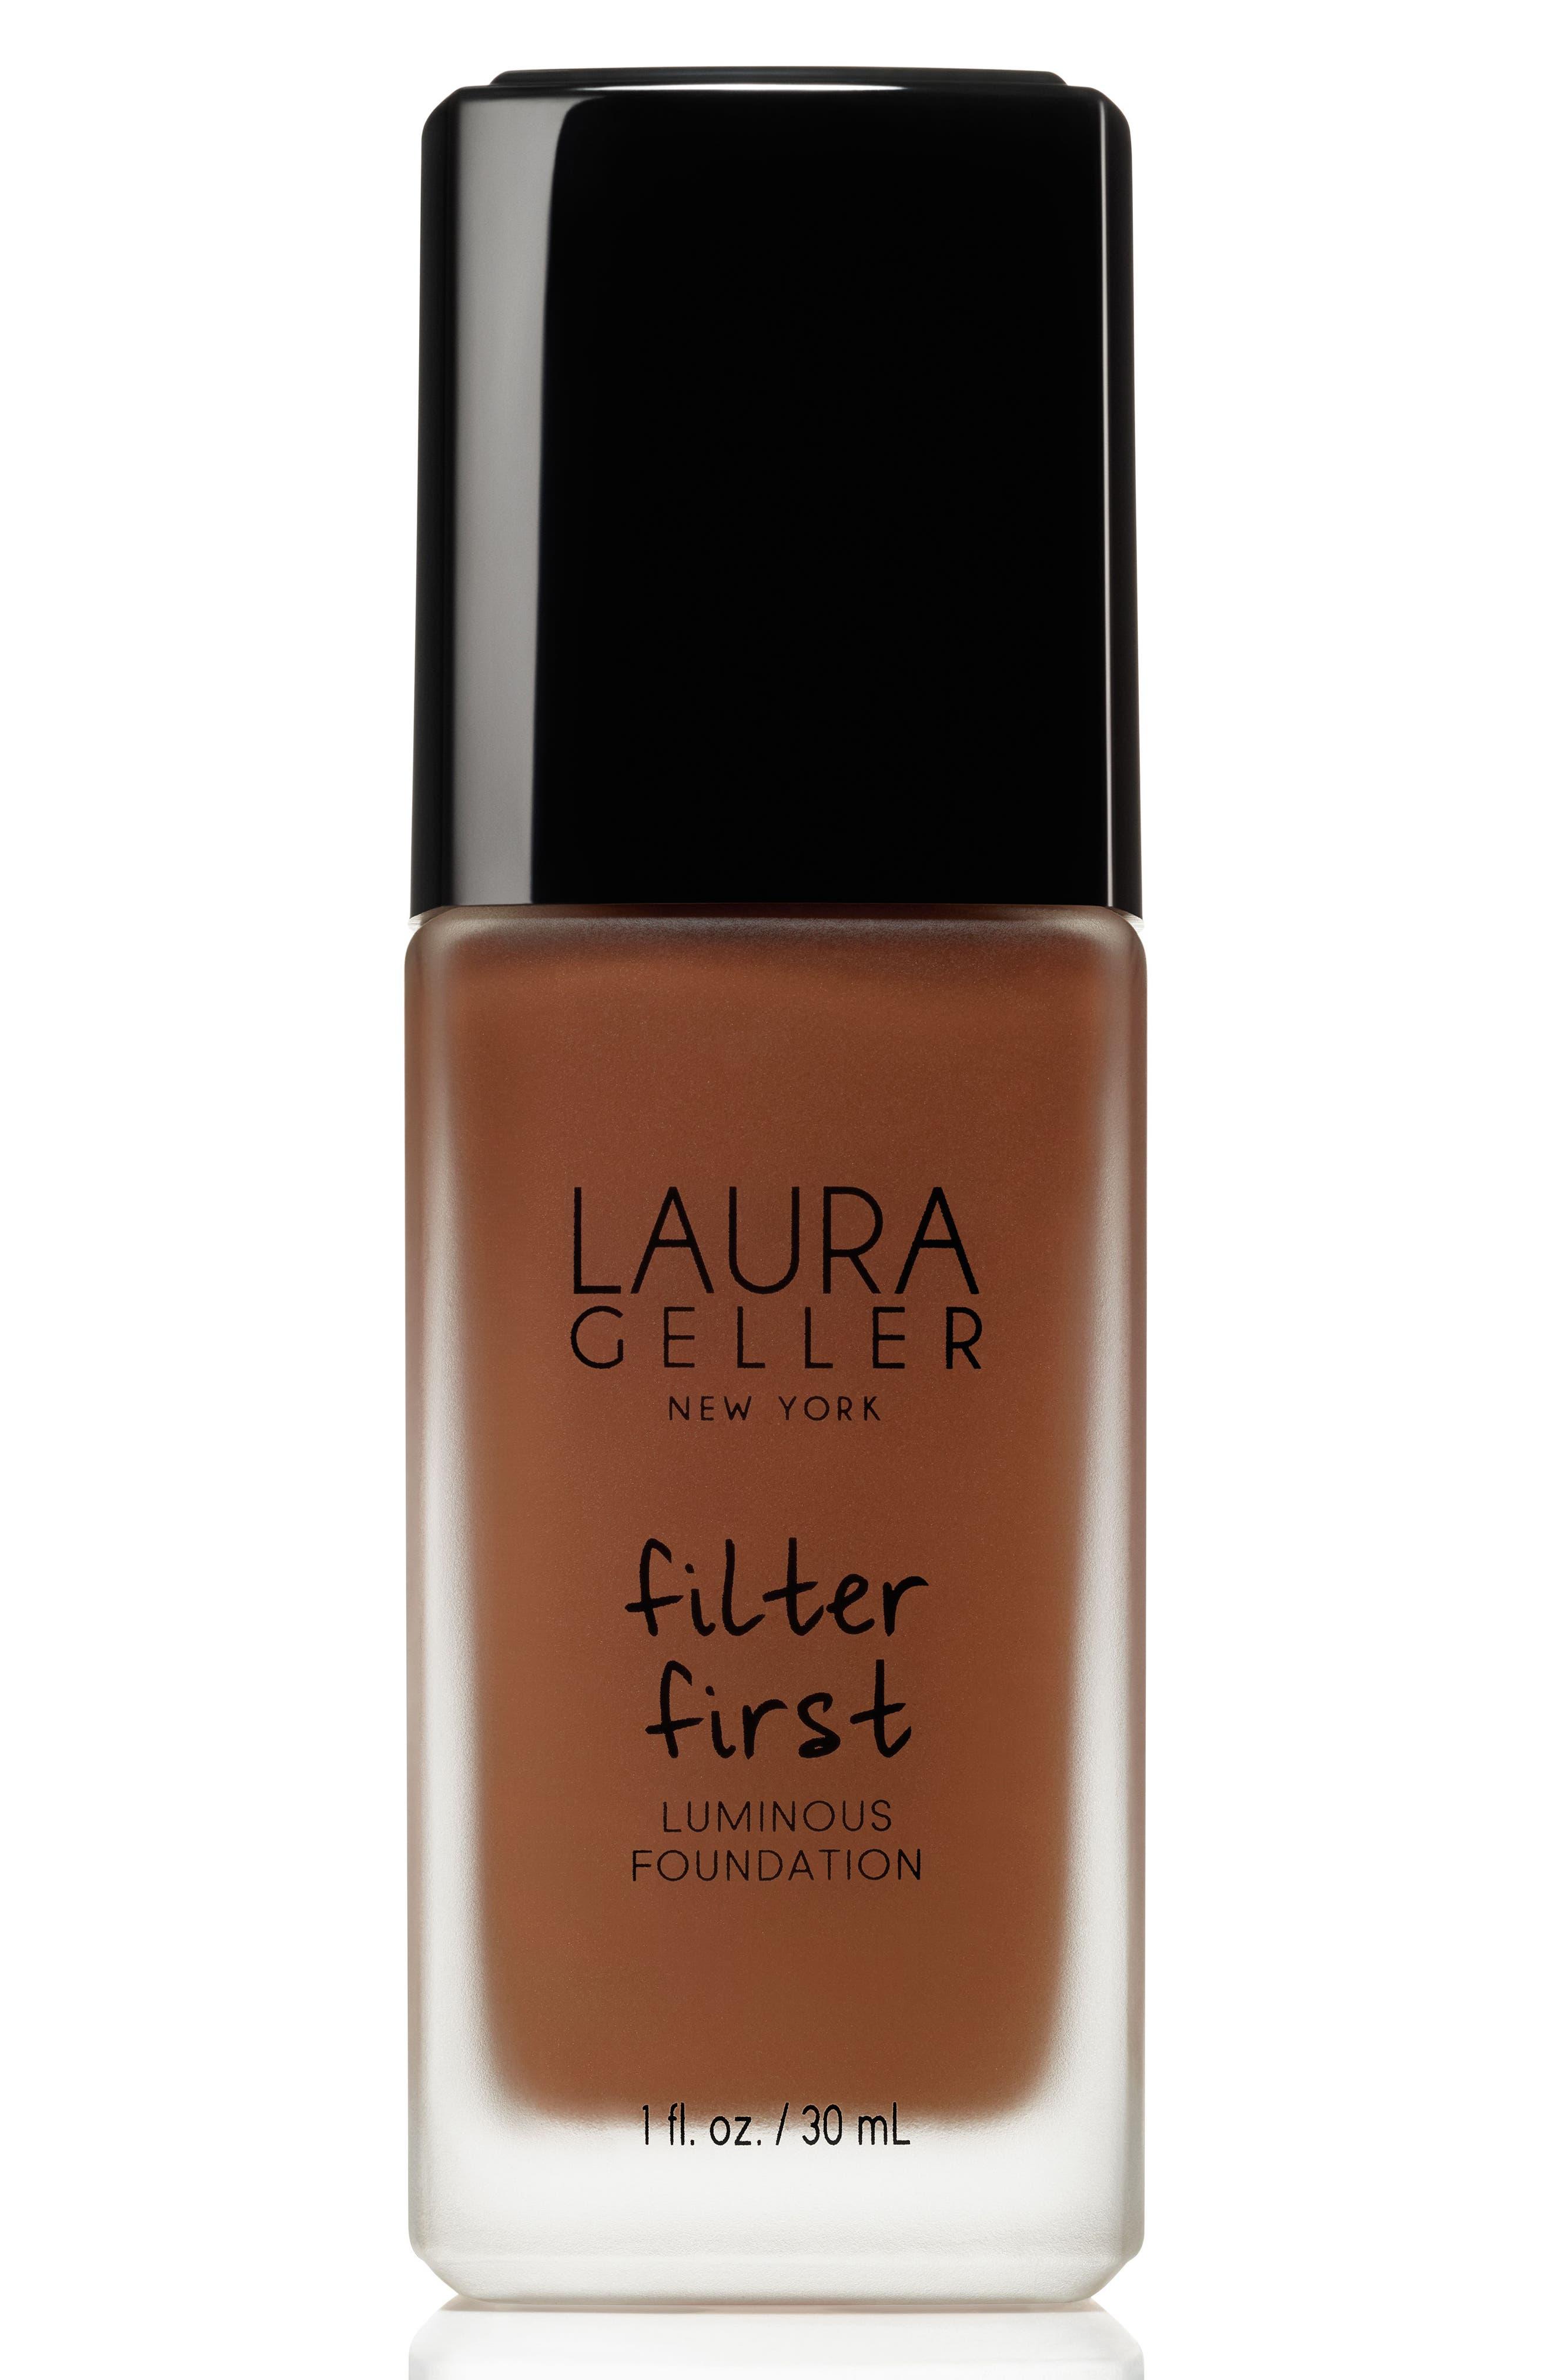 Image of Laura Geller New York Filter First Luminous Foundation - Mahogany